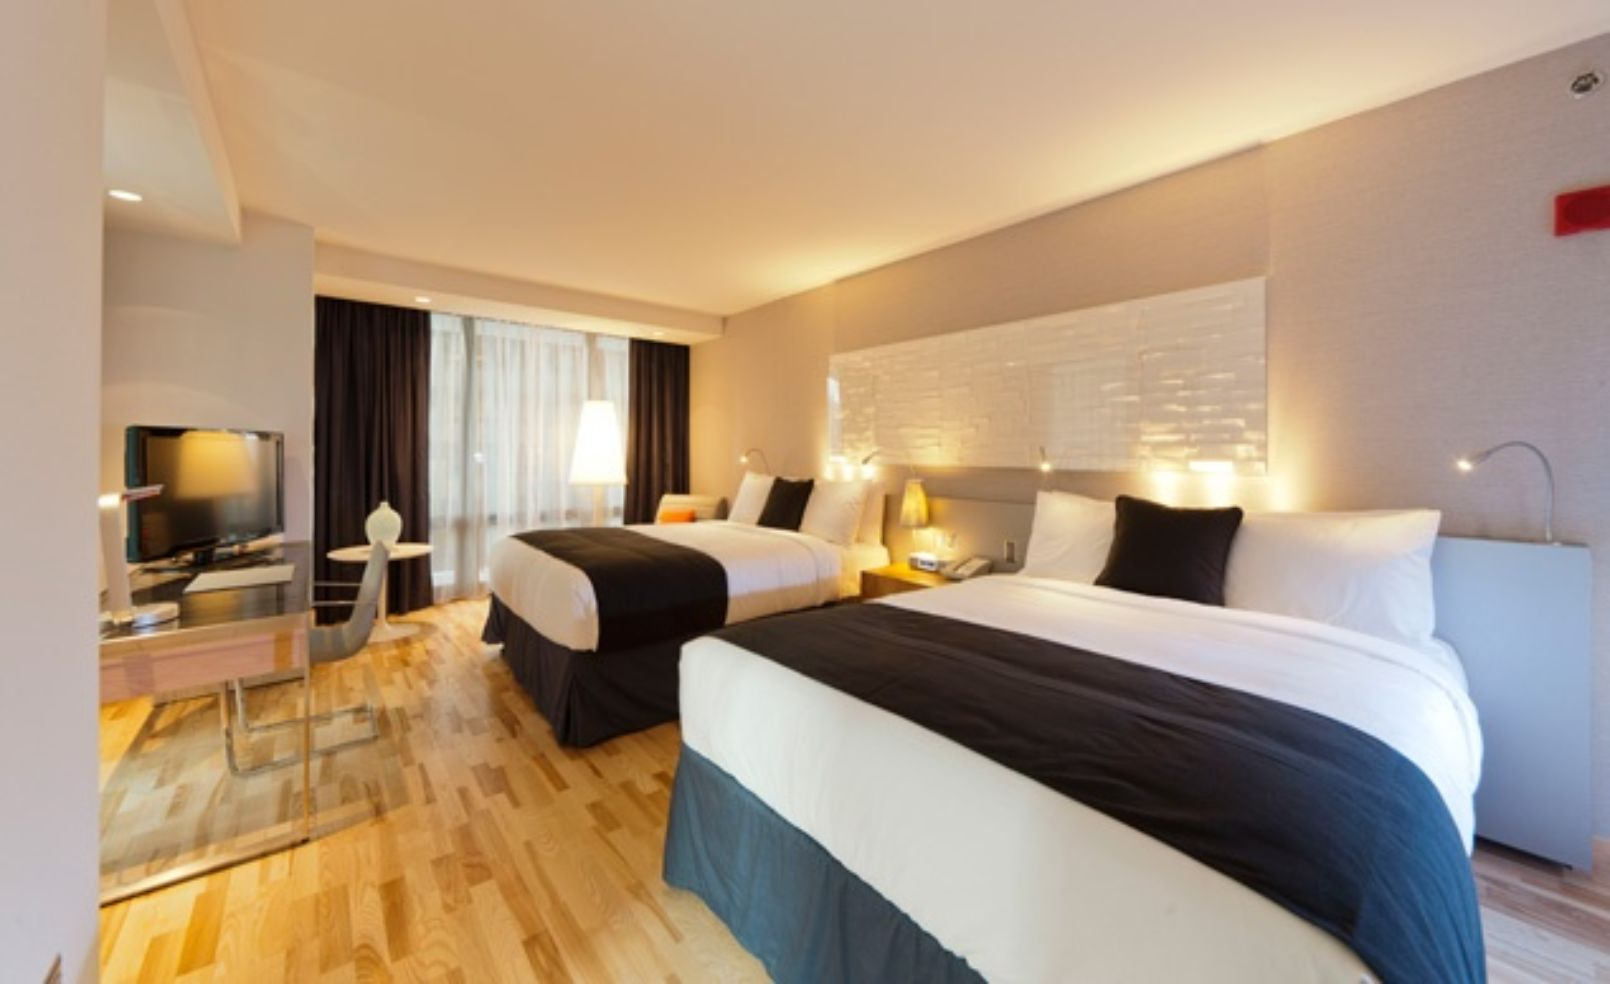 room at the Radisson Blu Aqua Hotel